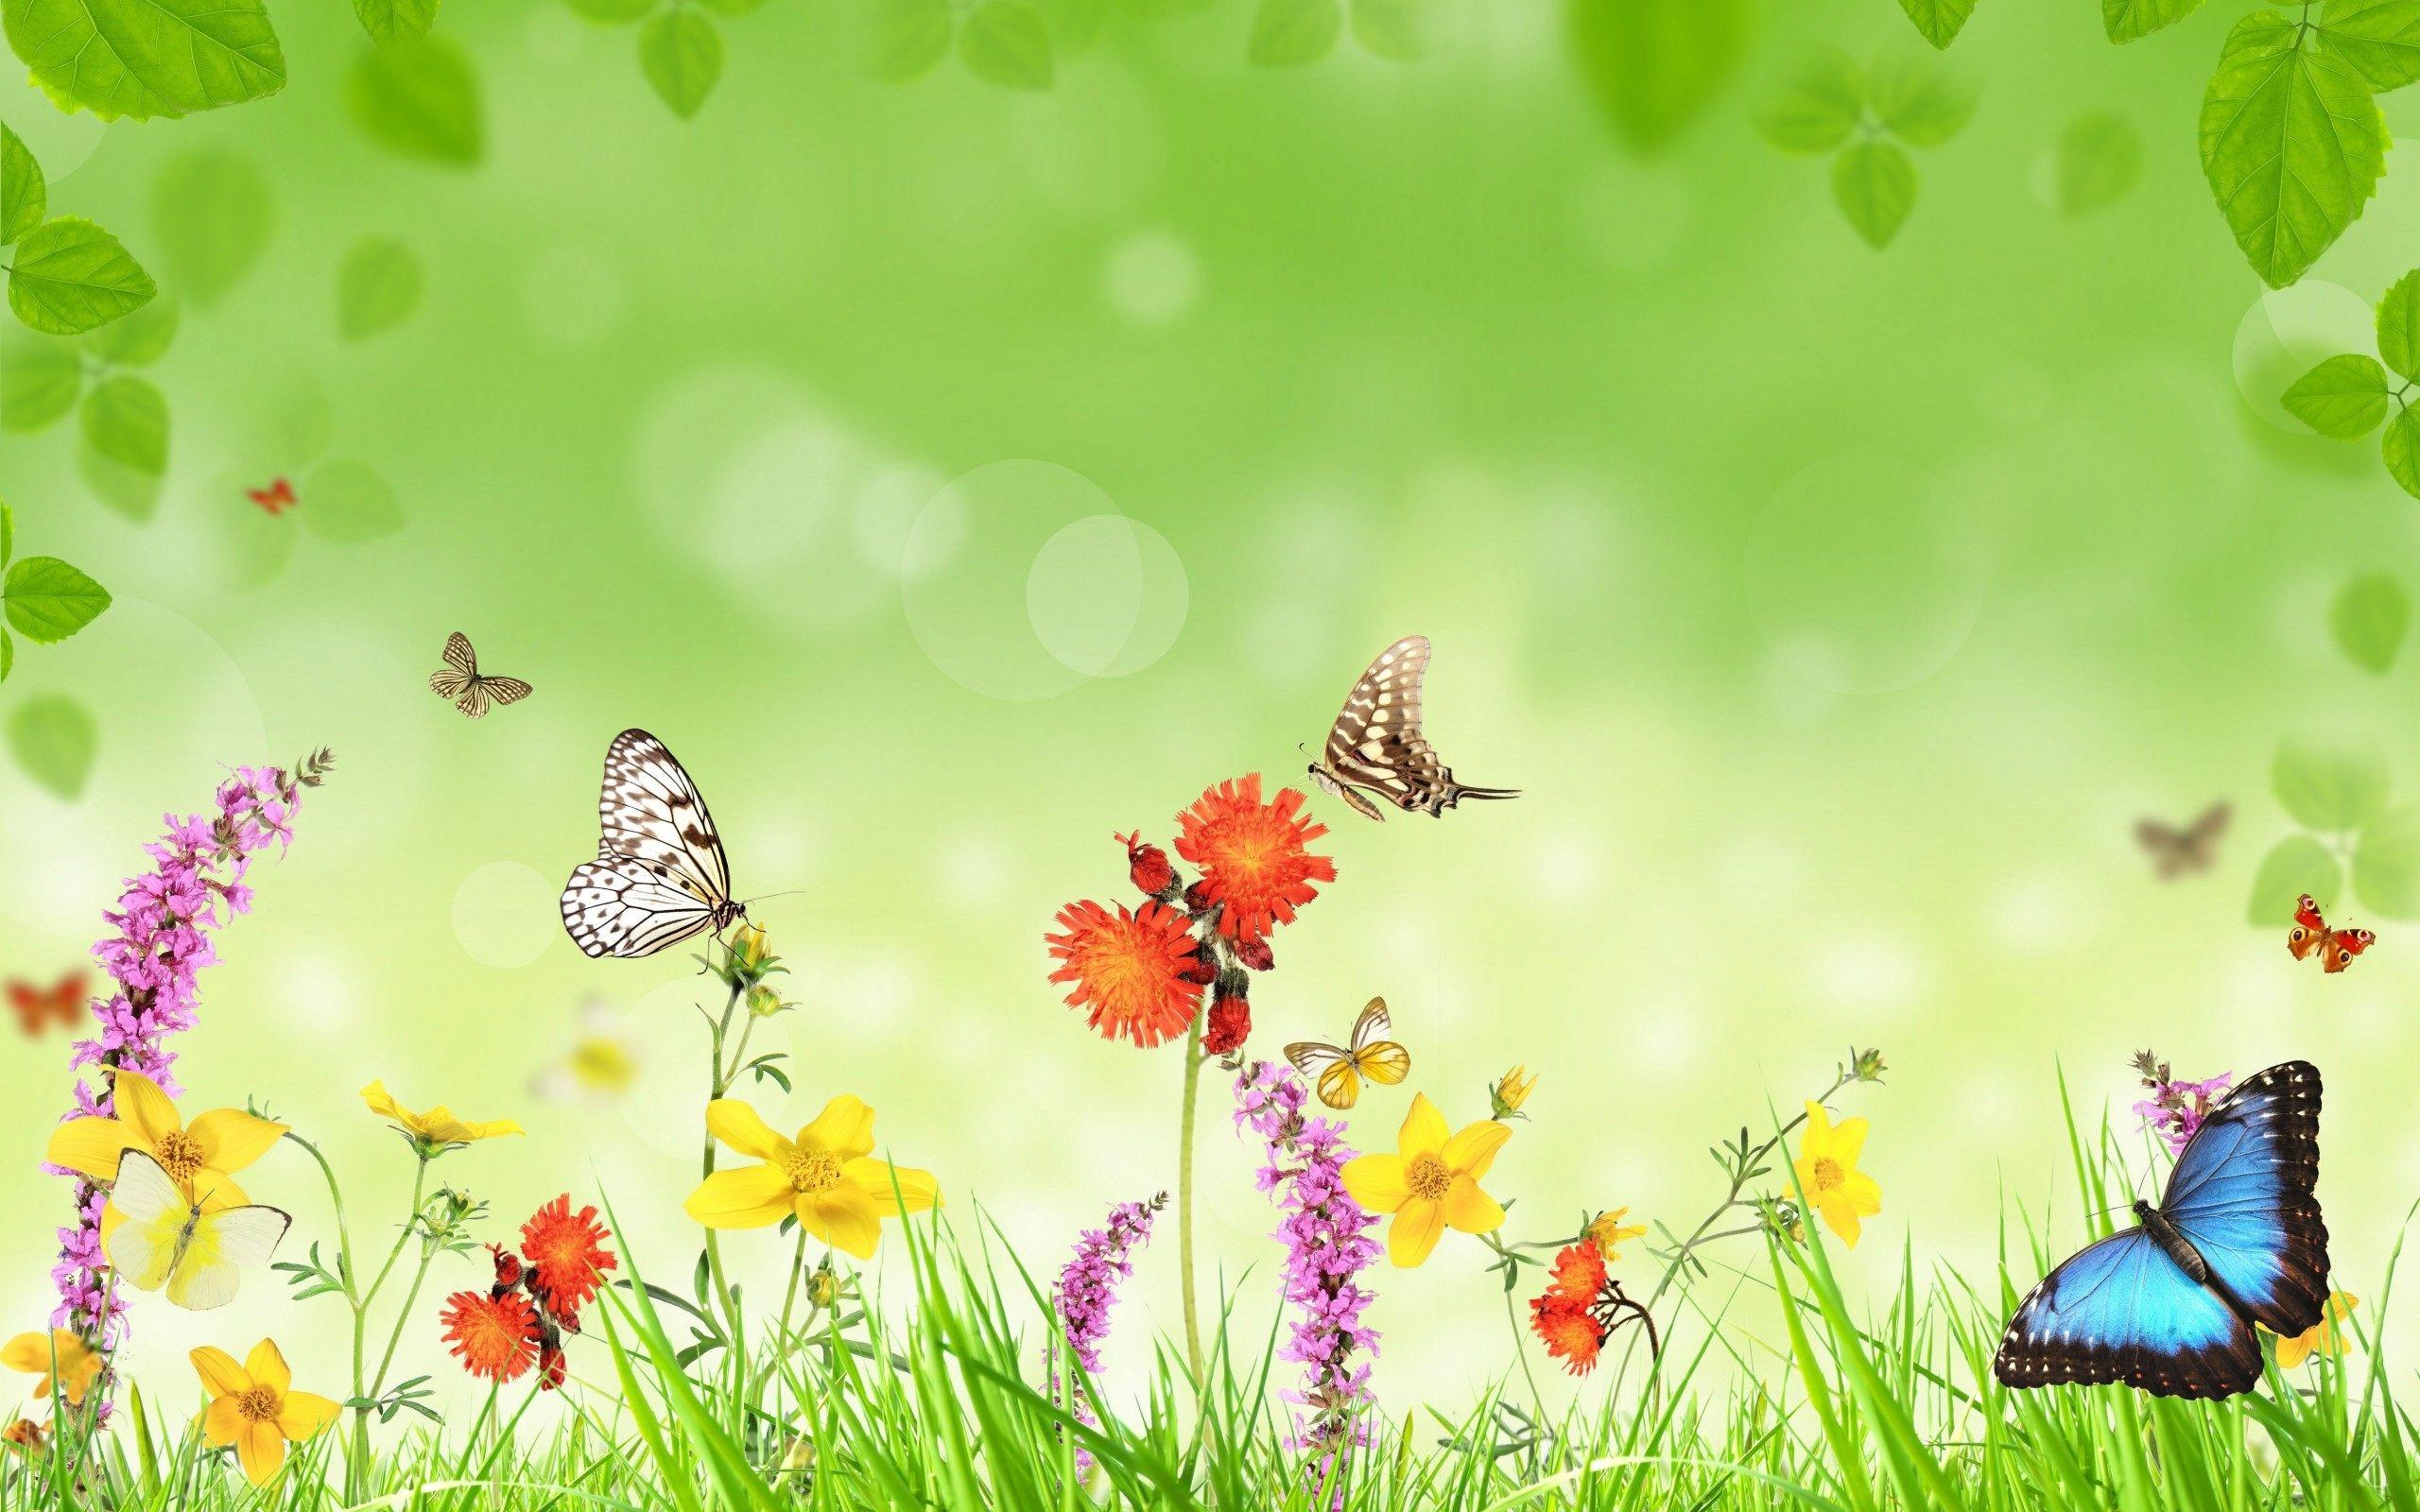 Butterfly Backgrounds ① Download Free Stunning High - Butterfly wallpaper for computer desktop